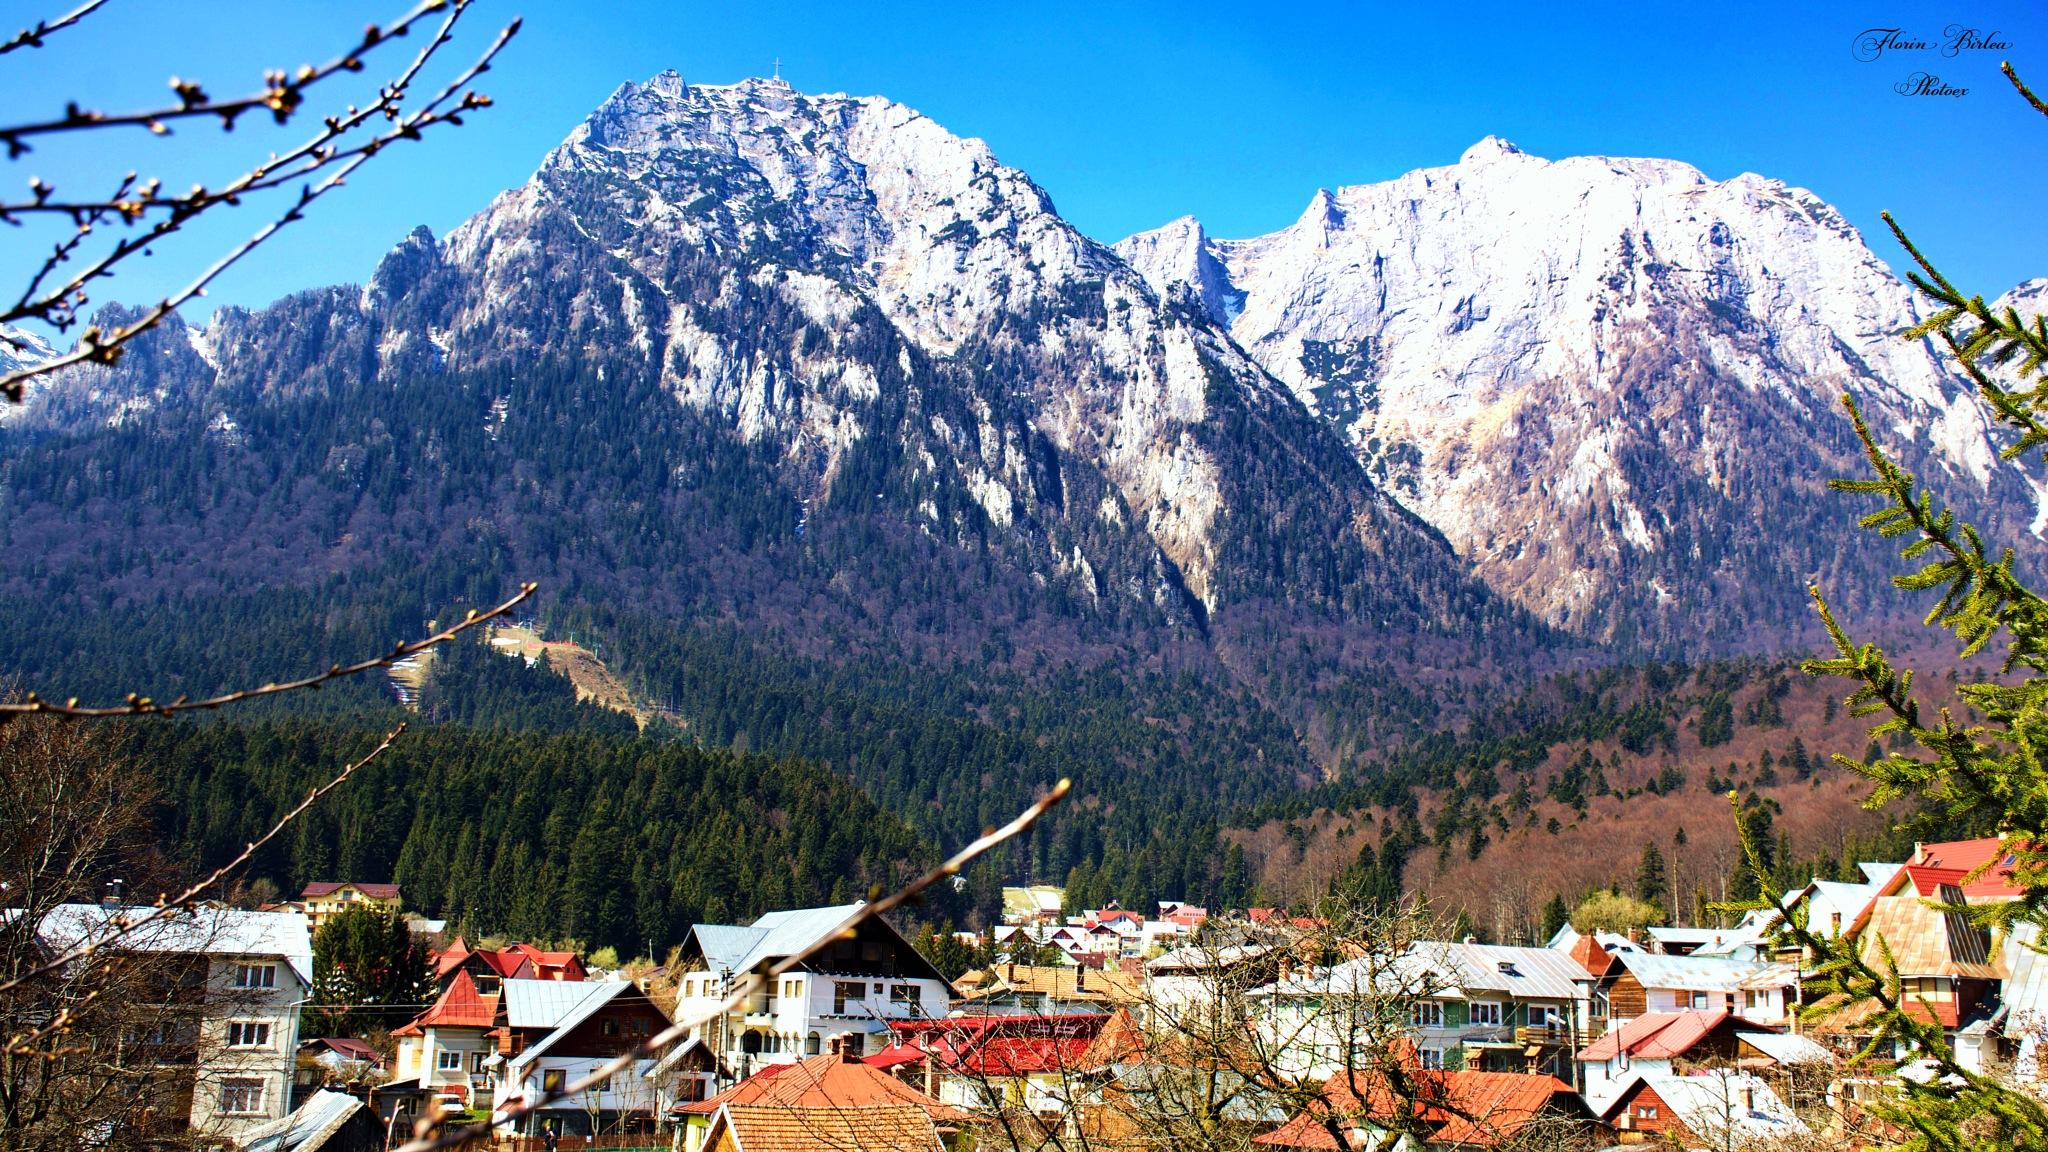 Bucegi Mountains by Florian B